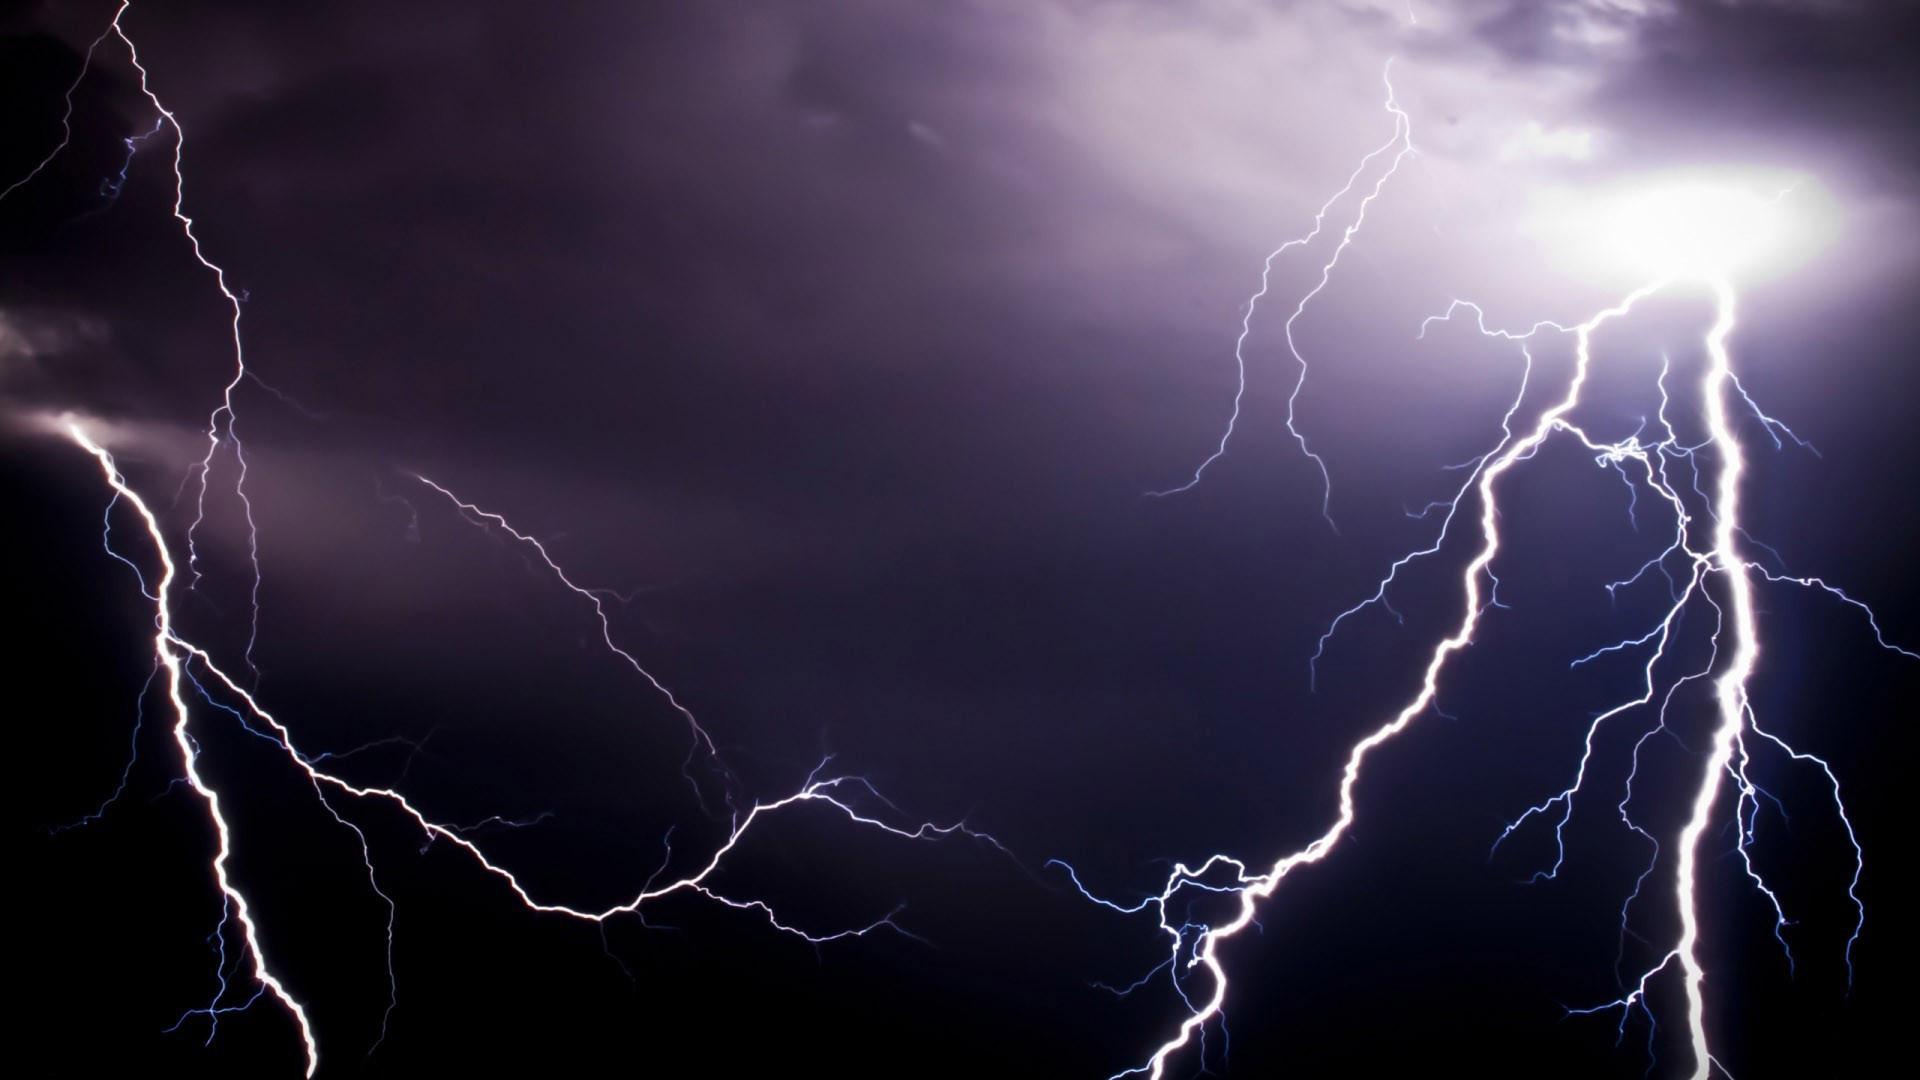 Res: 1920x1080, Photos Lightning Wallpapers HD.